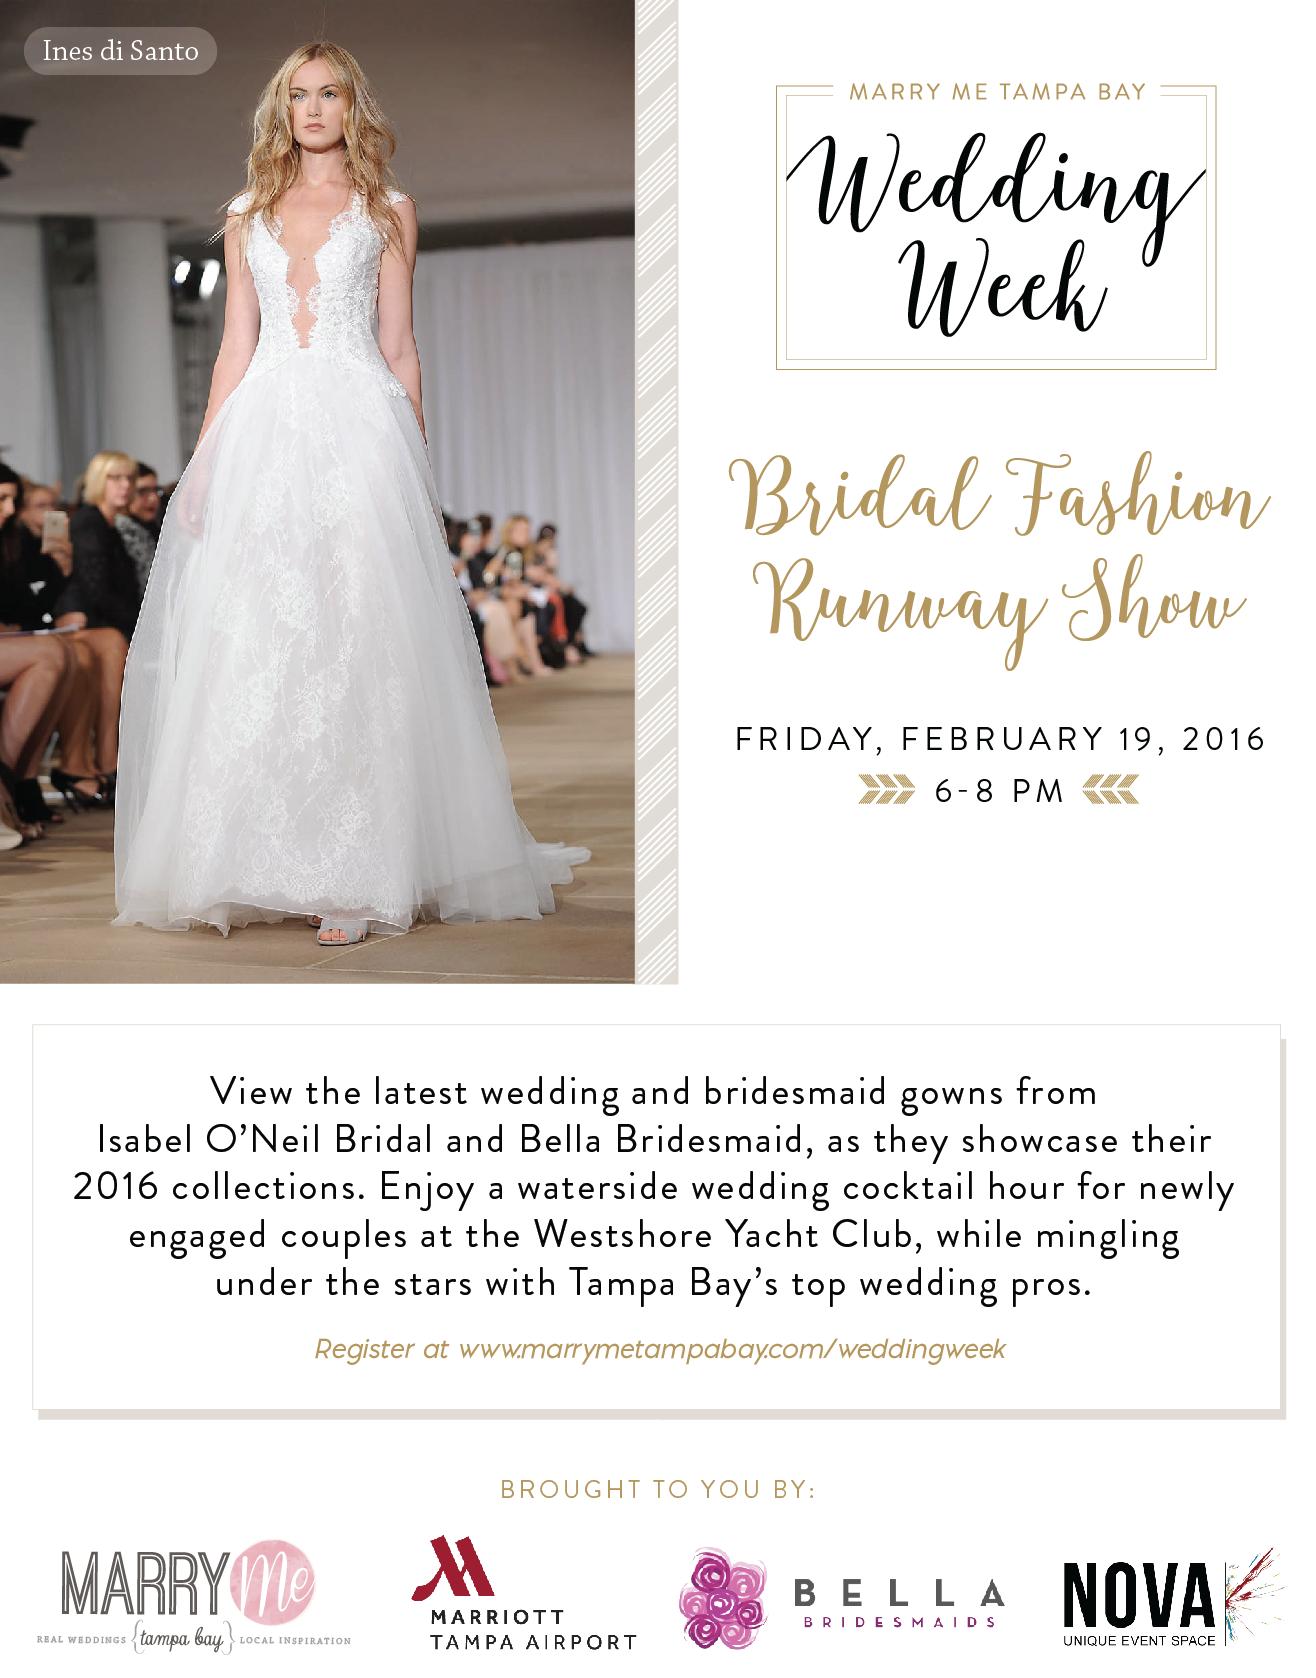 Bridal Fashion Runway Show Marry Me Tampa Bay Wedding Week Ines Di Santo